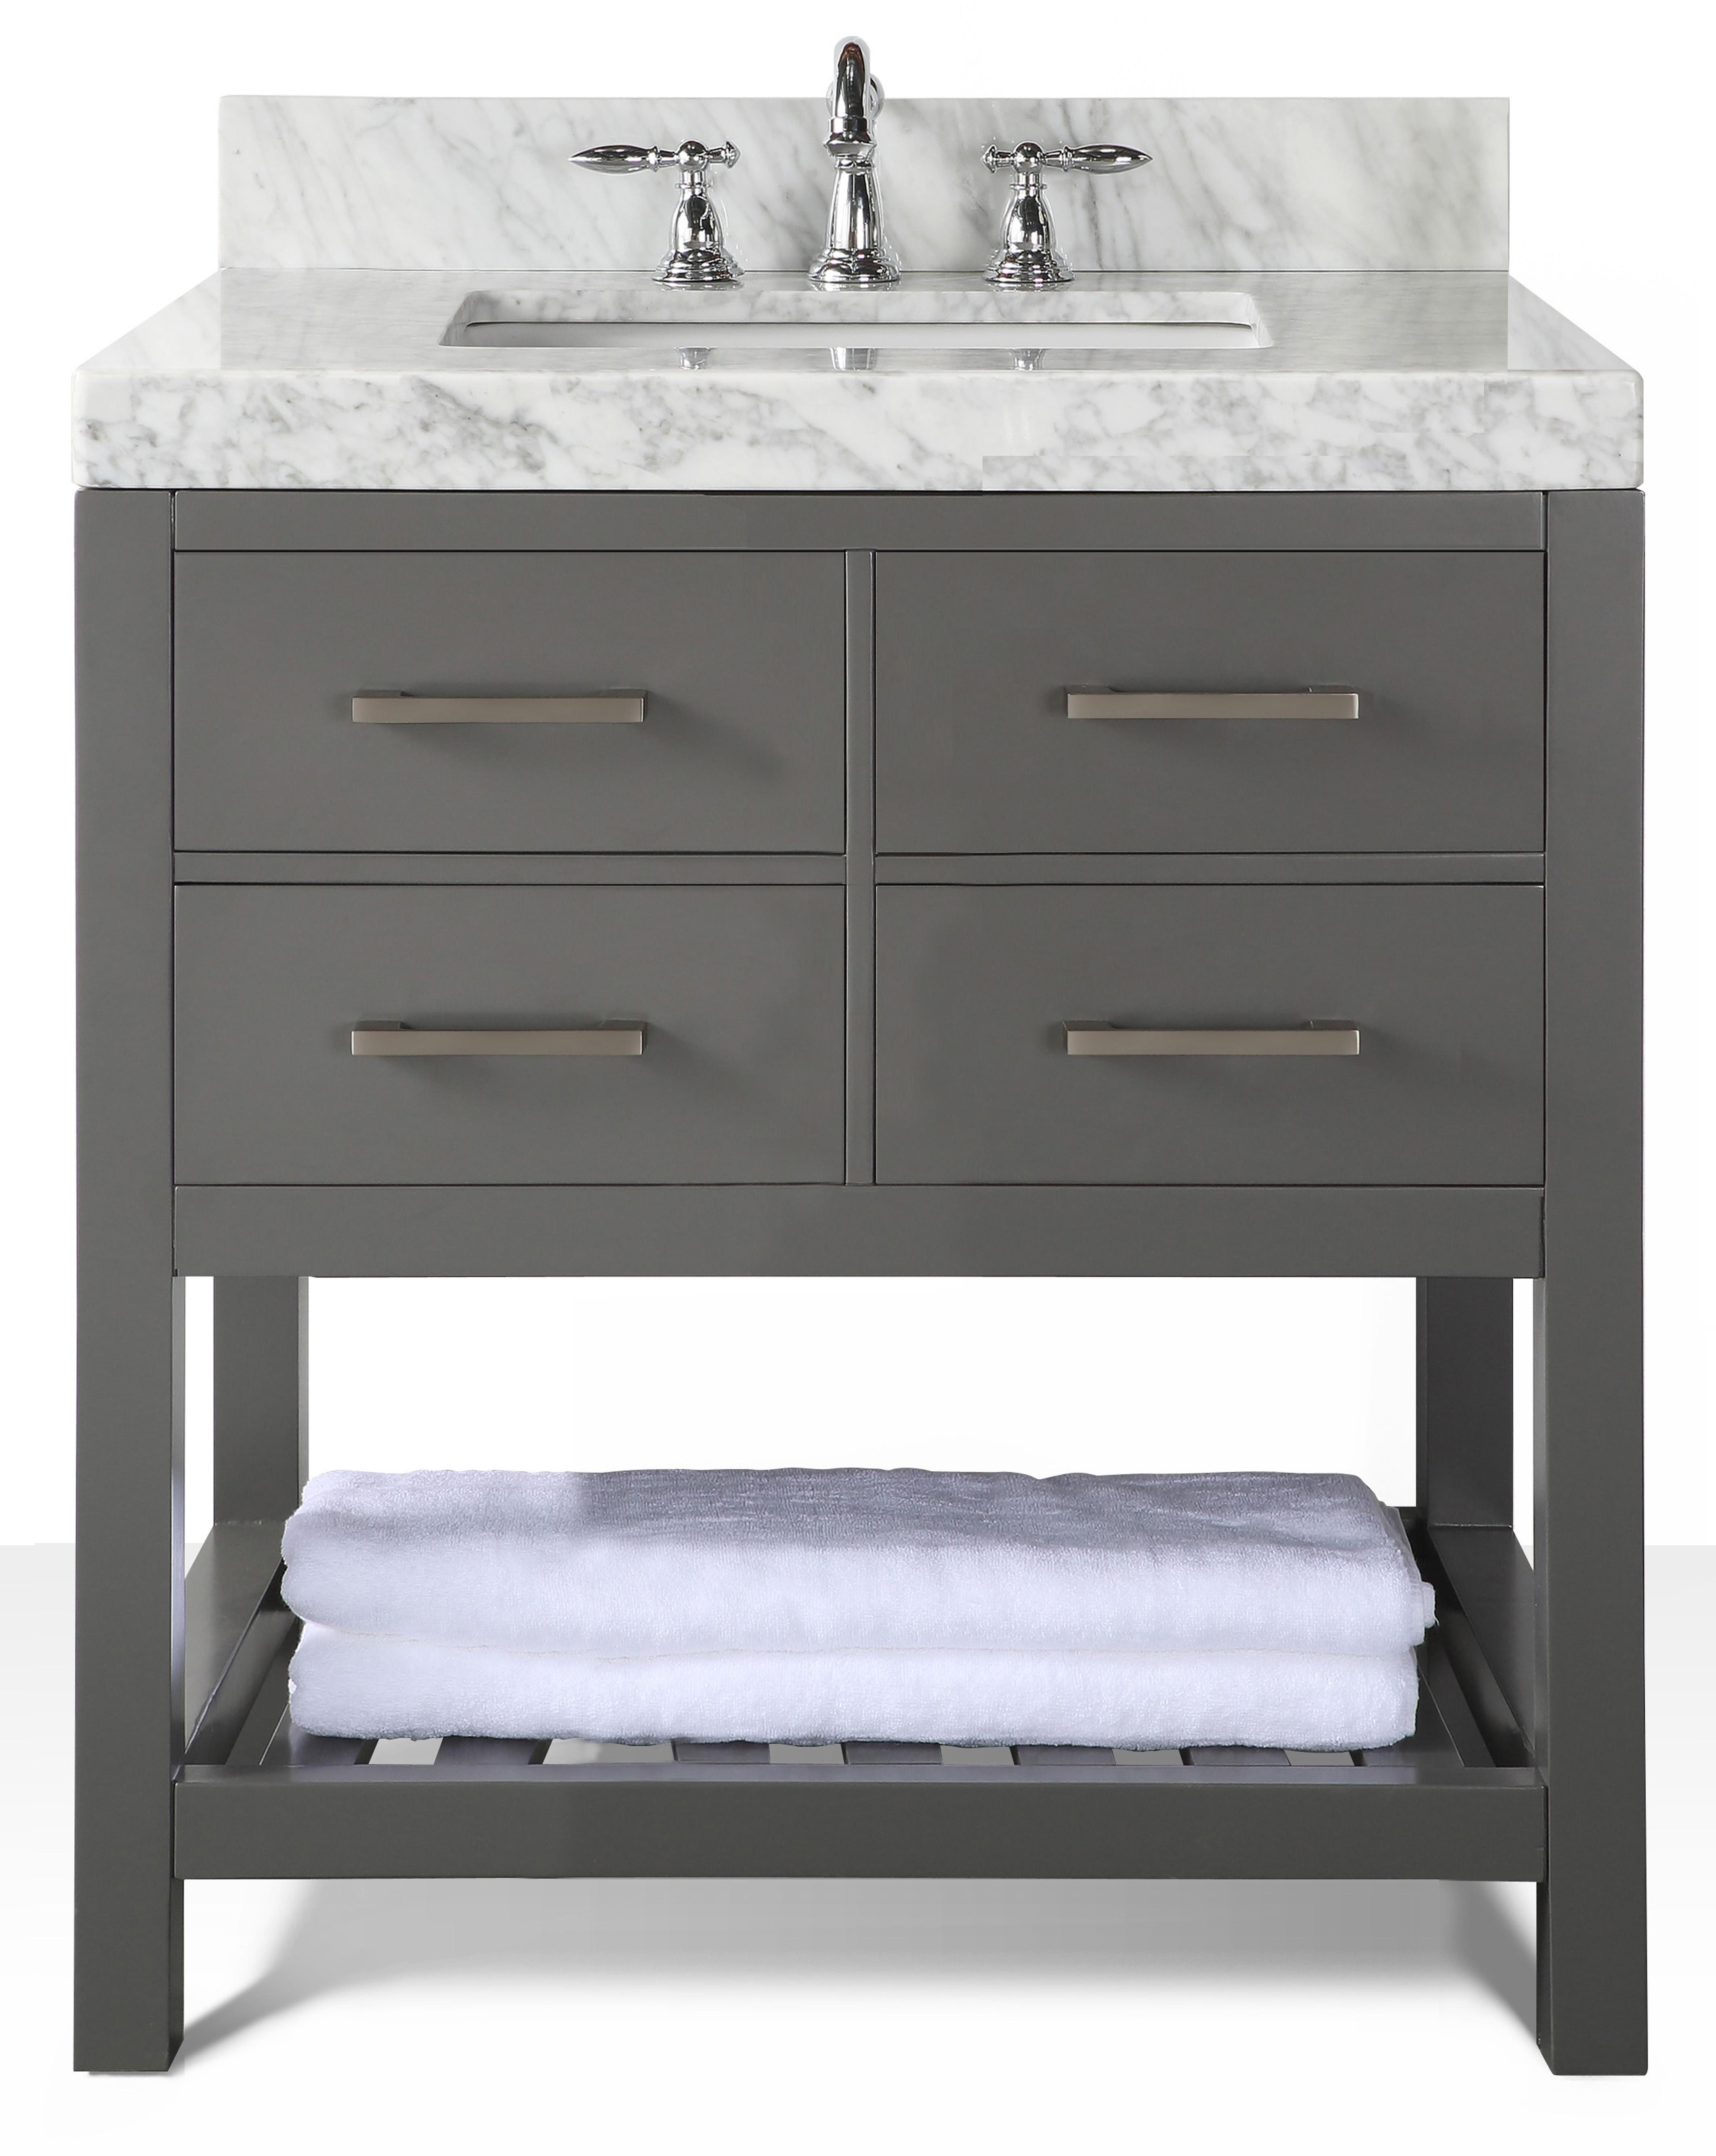 "36"" Single Sink Bath Vanity Set in Sapphire Gray with Italian Carrara White Marble Vanity top and White Undermount Basin"